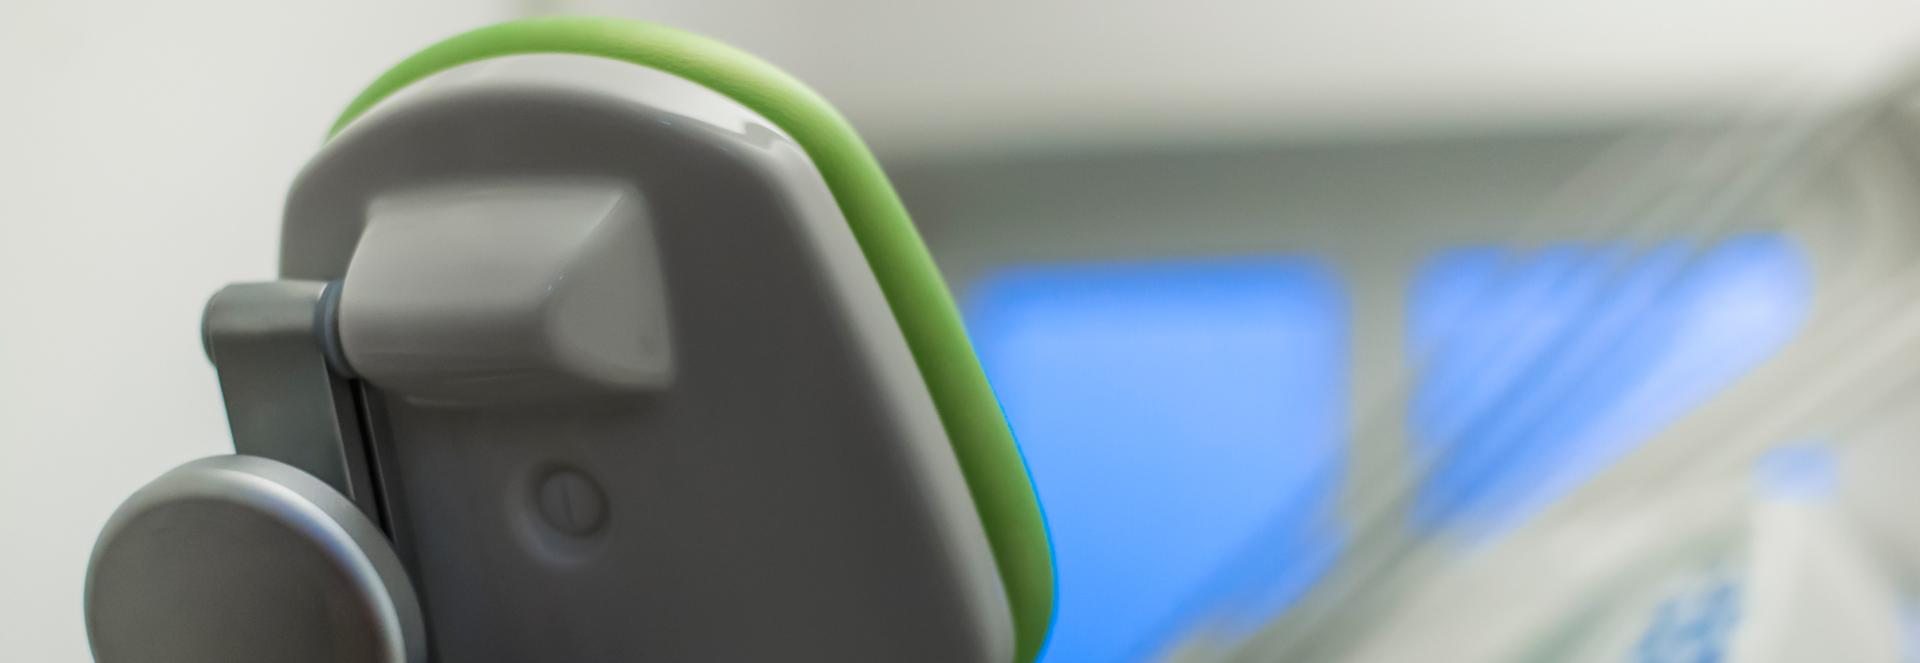 Dettaglio sedia